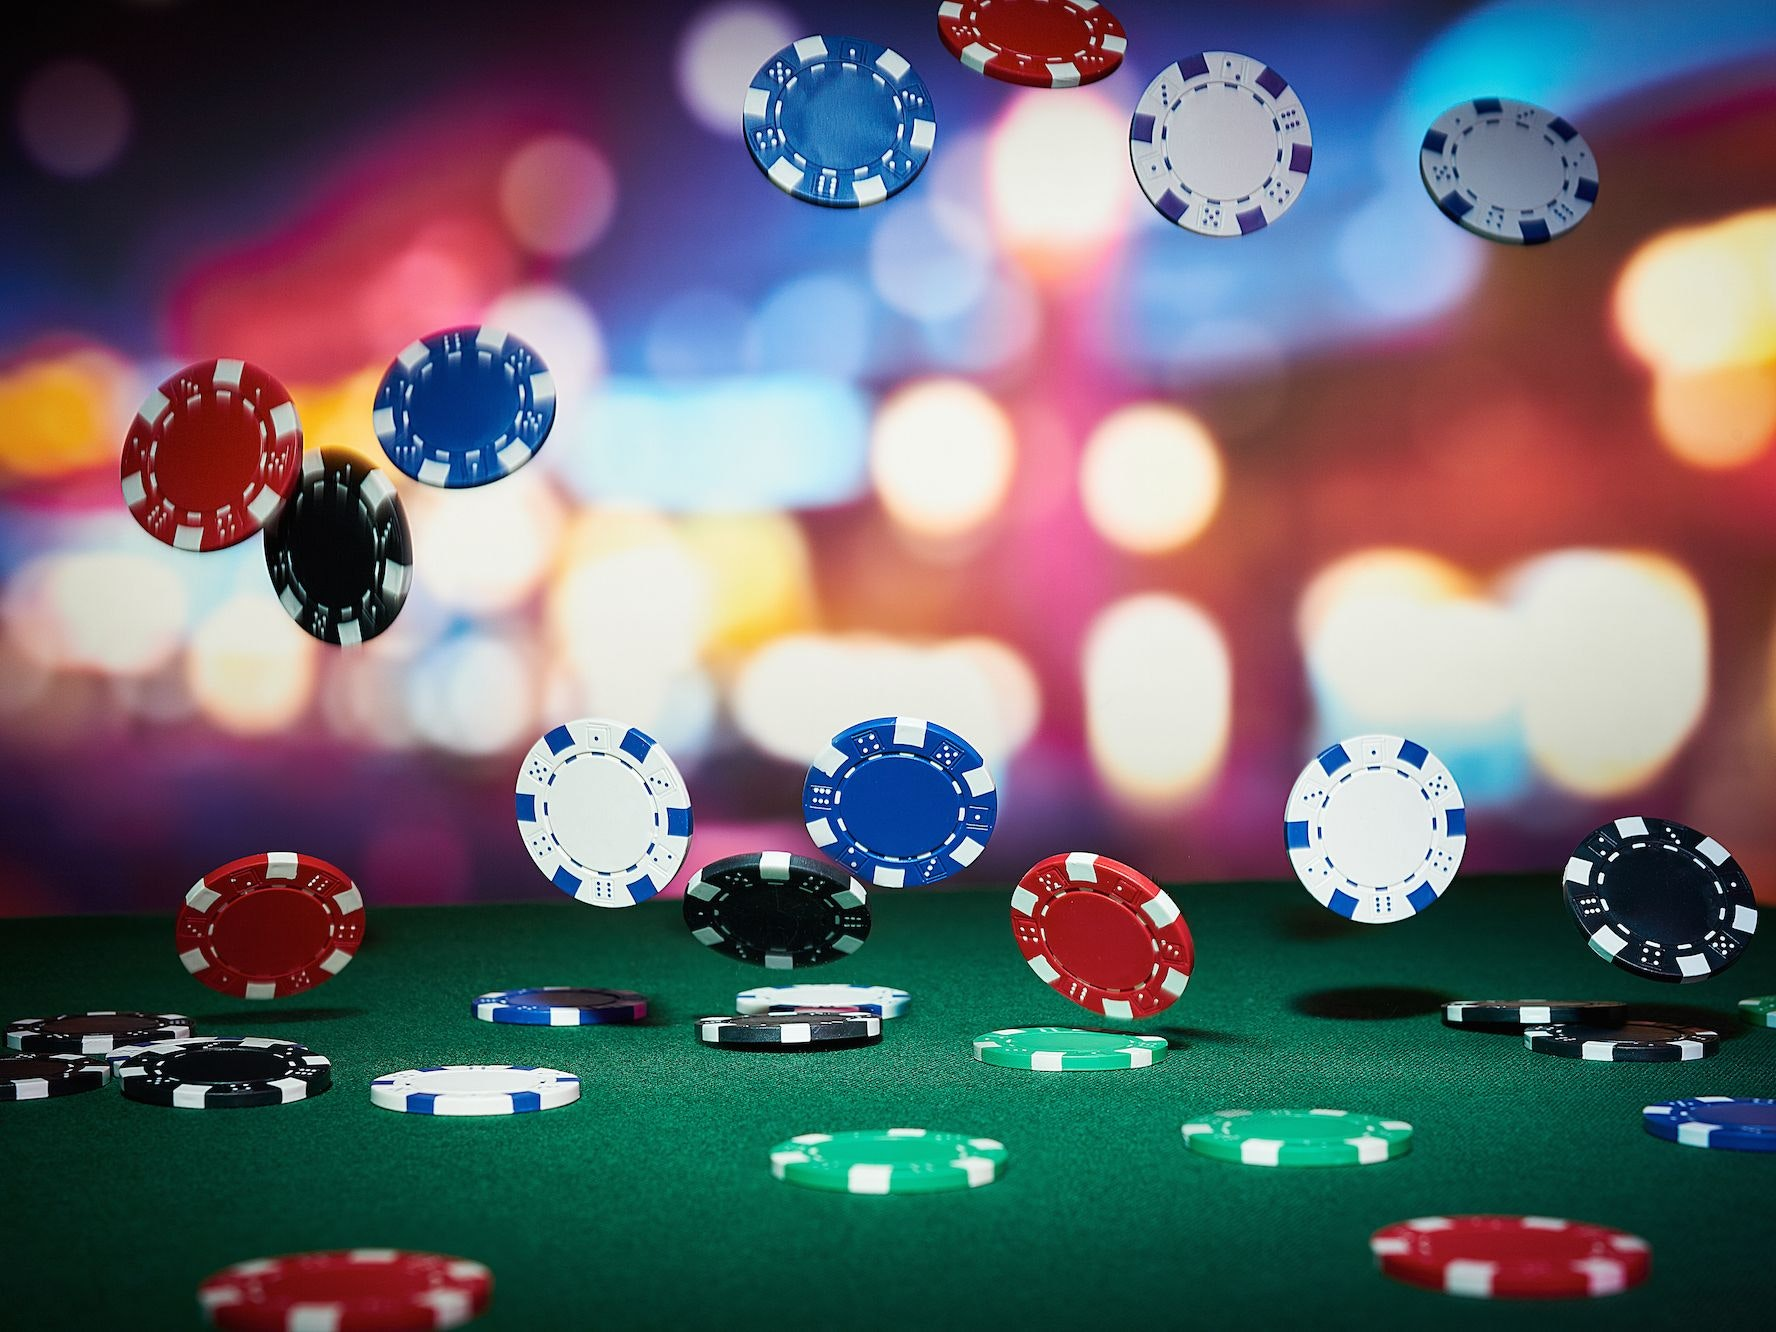 Software for casinos: